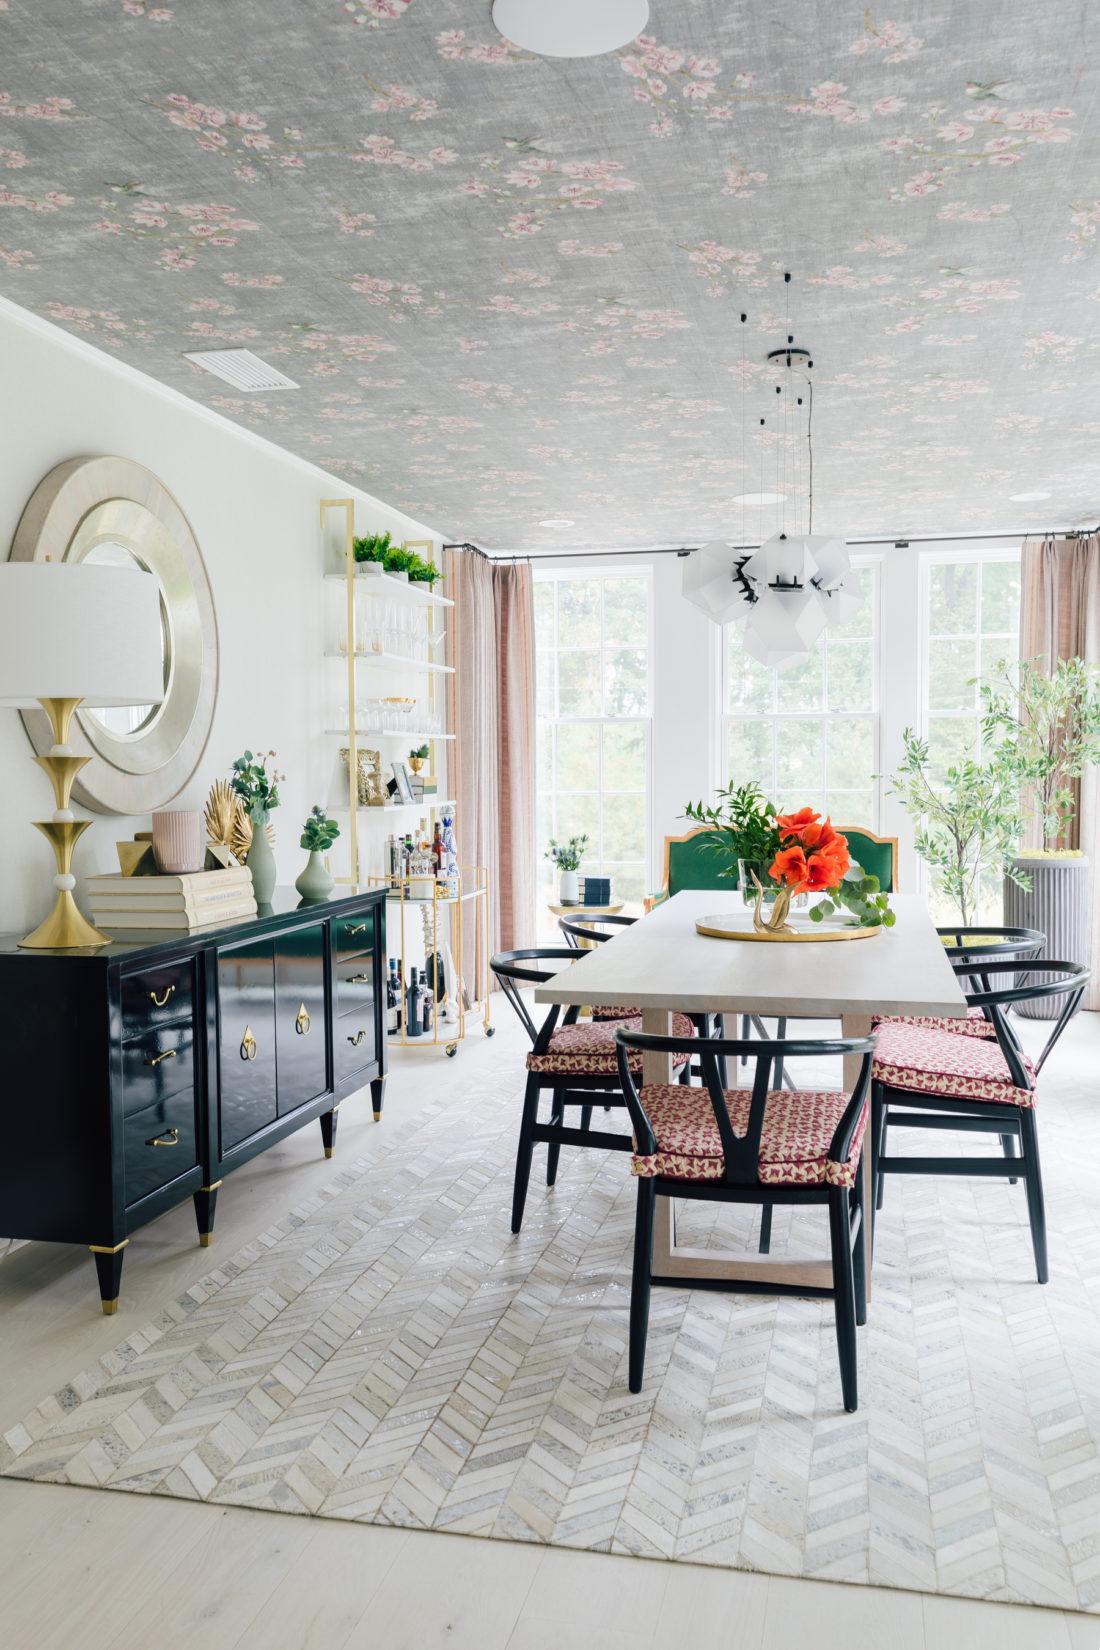 Eva Amurri Martino's newly renovated dining room